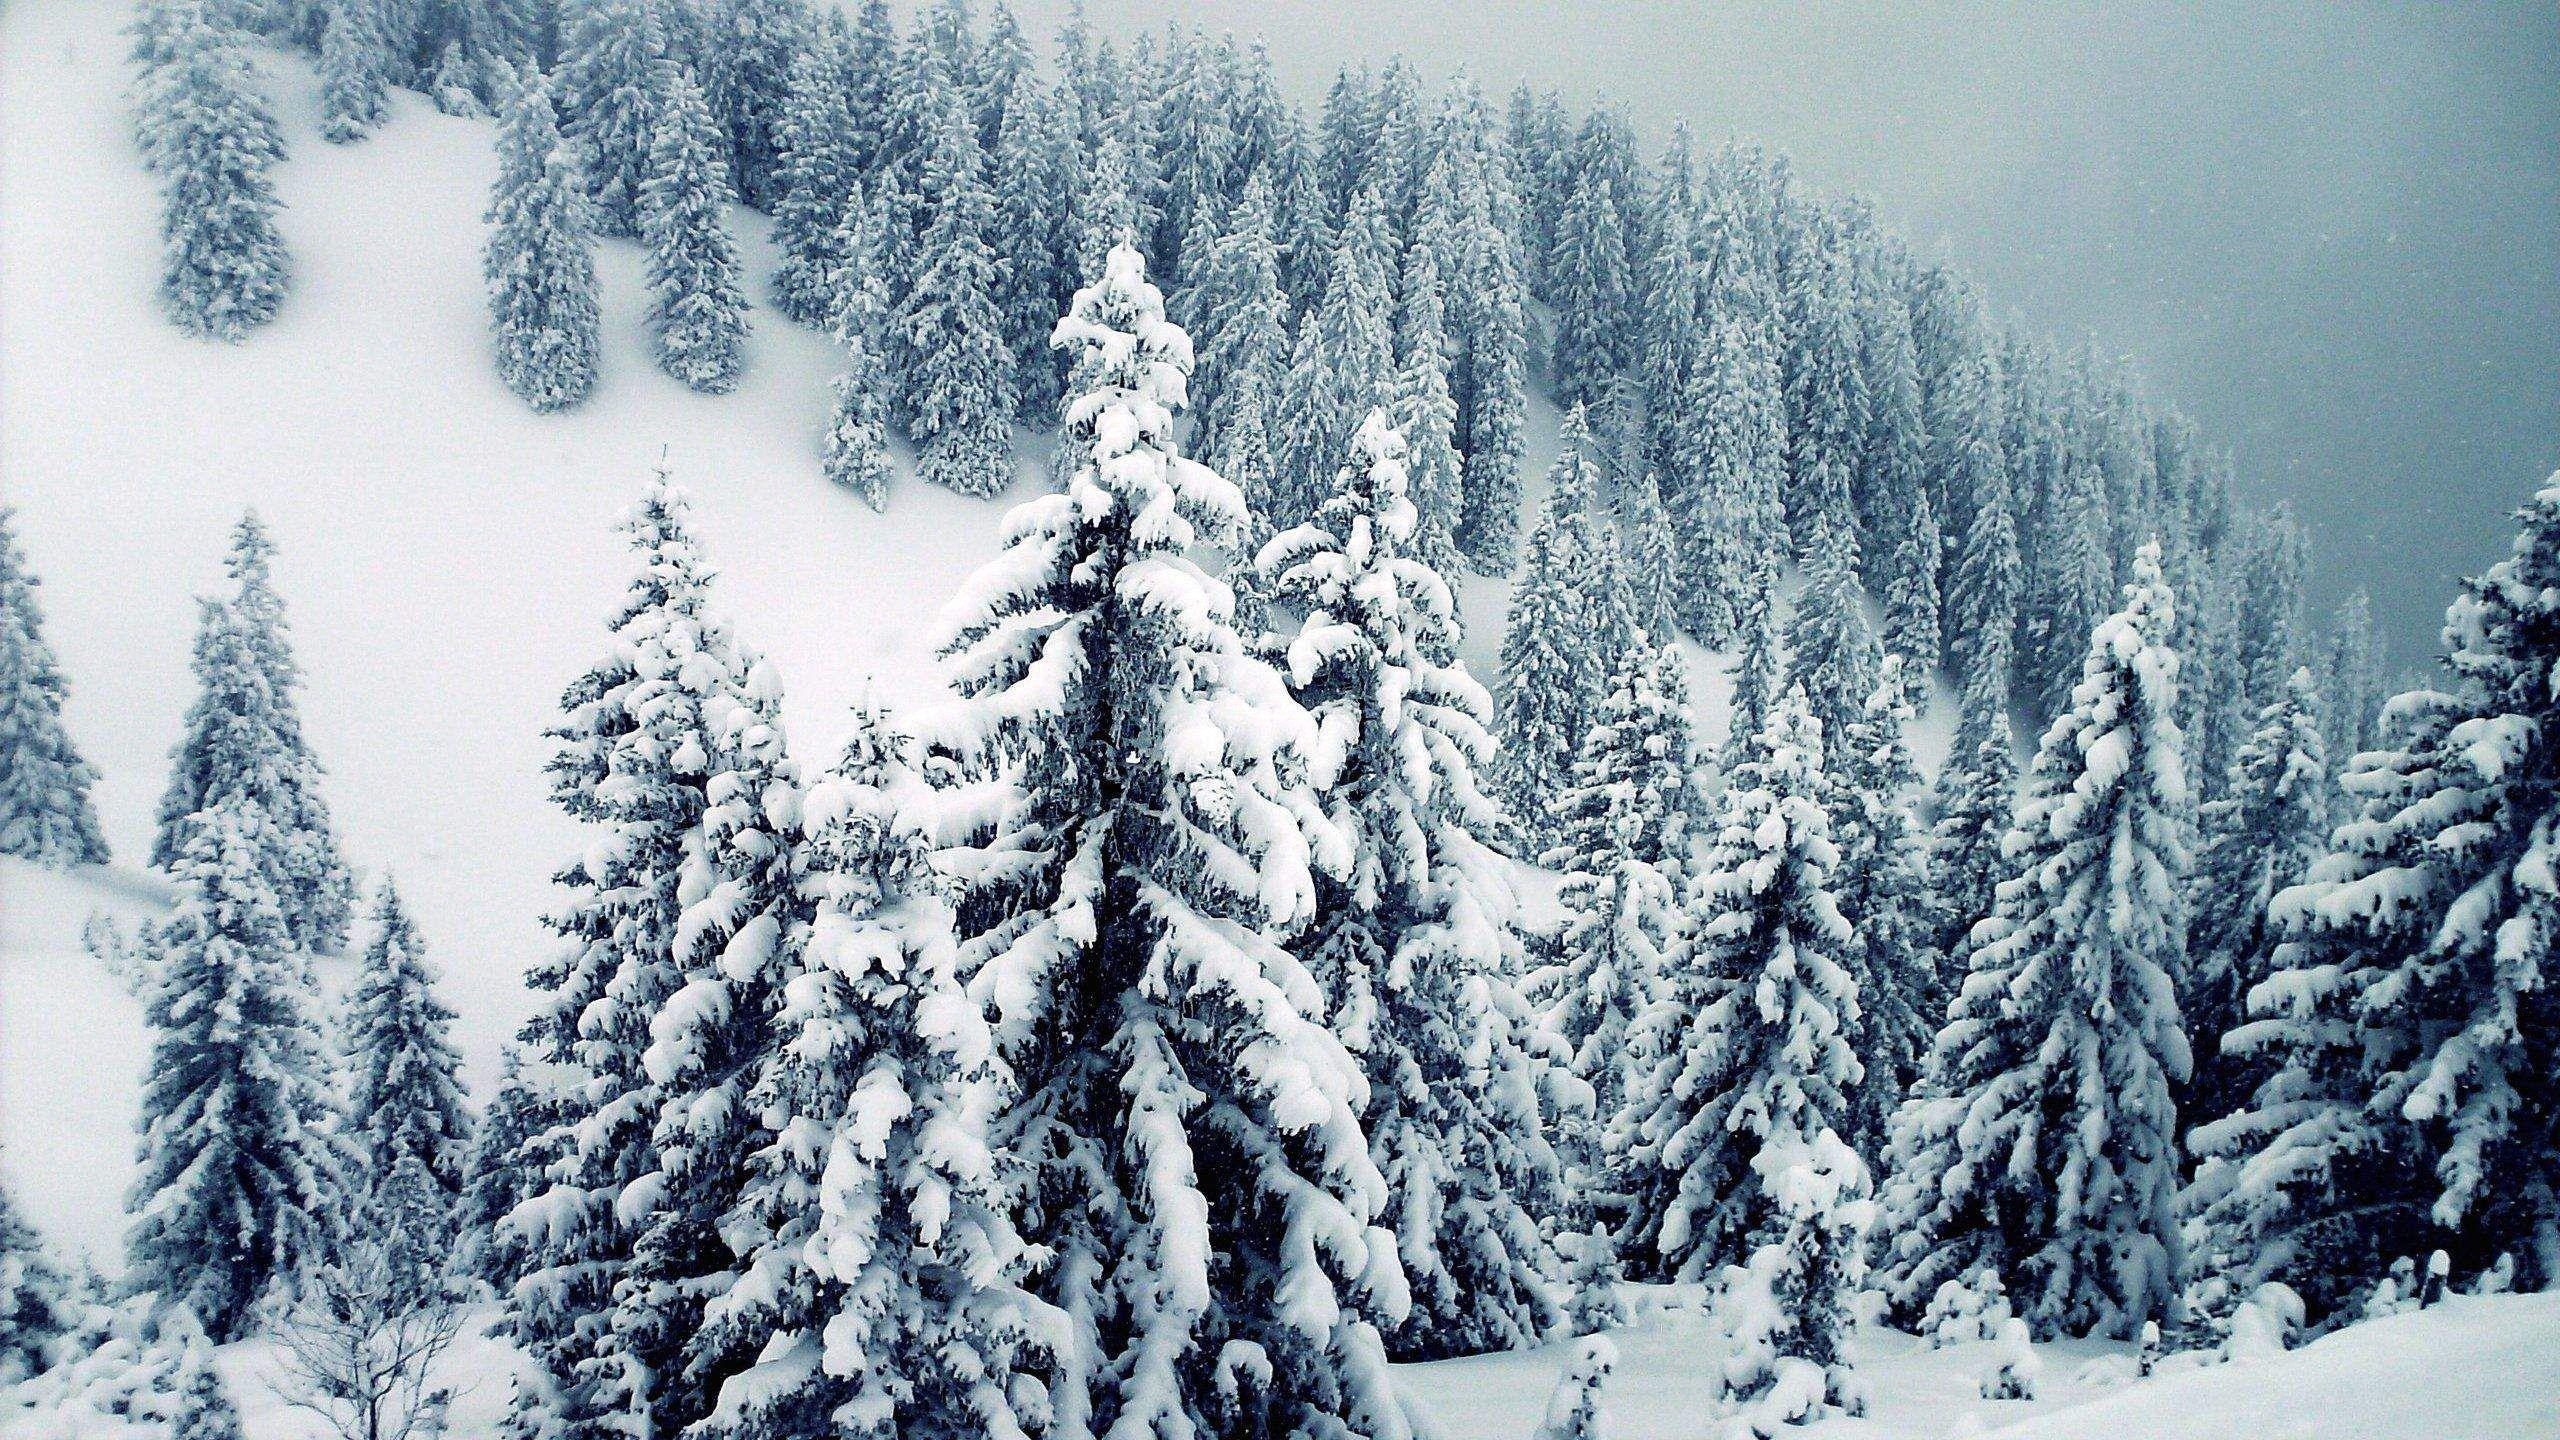 Snow Winter Trees Wallpaper Wallpaper Download Winter Trees Tree Wallpaper Forest Wallpaper Hd wallpaper snow winter forest trees